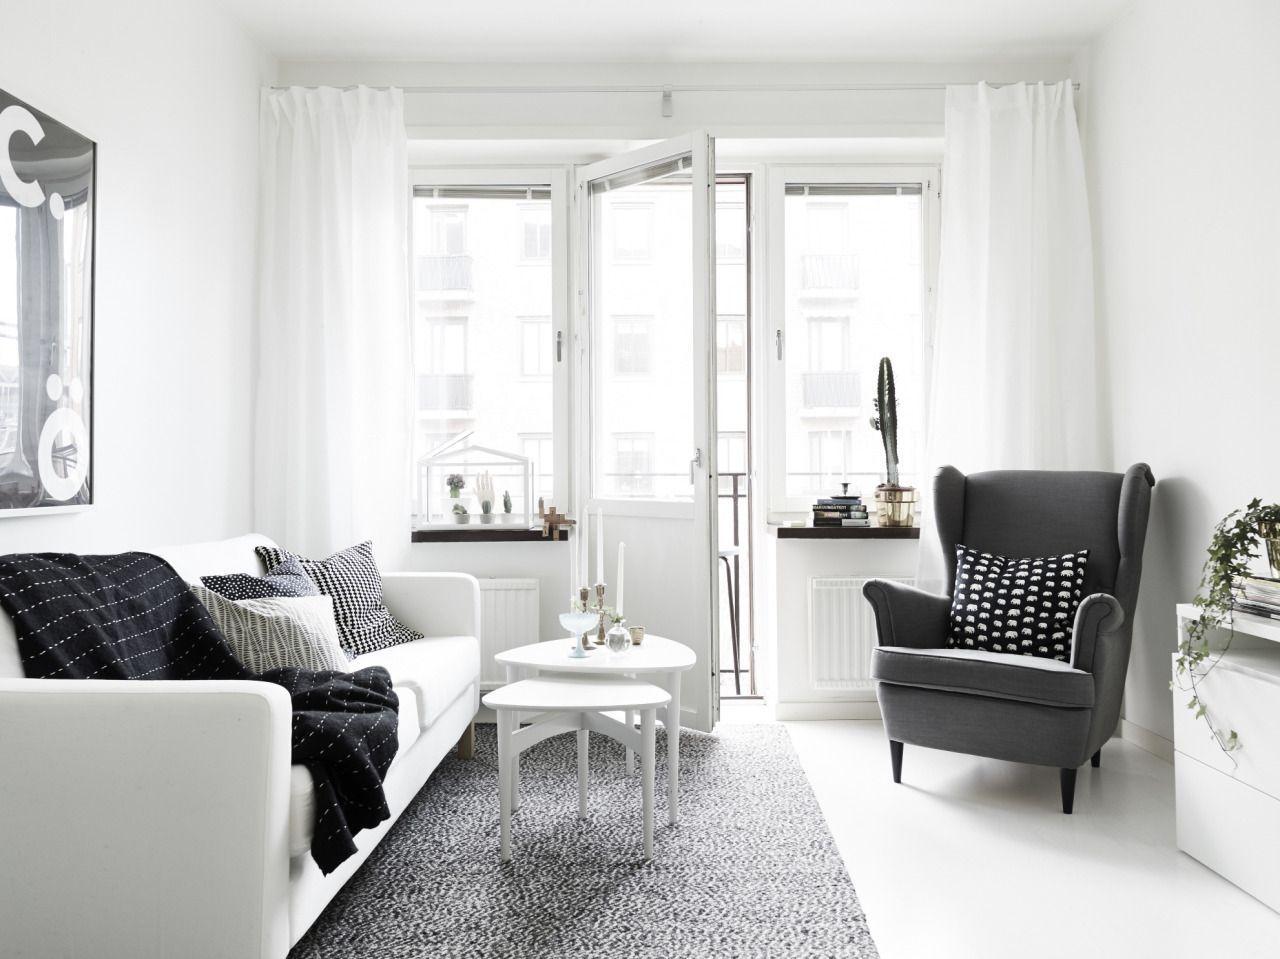 interiors, interior design, home decor, decorating ideas, living ...